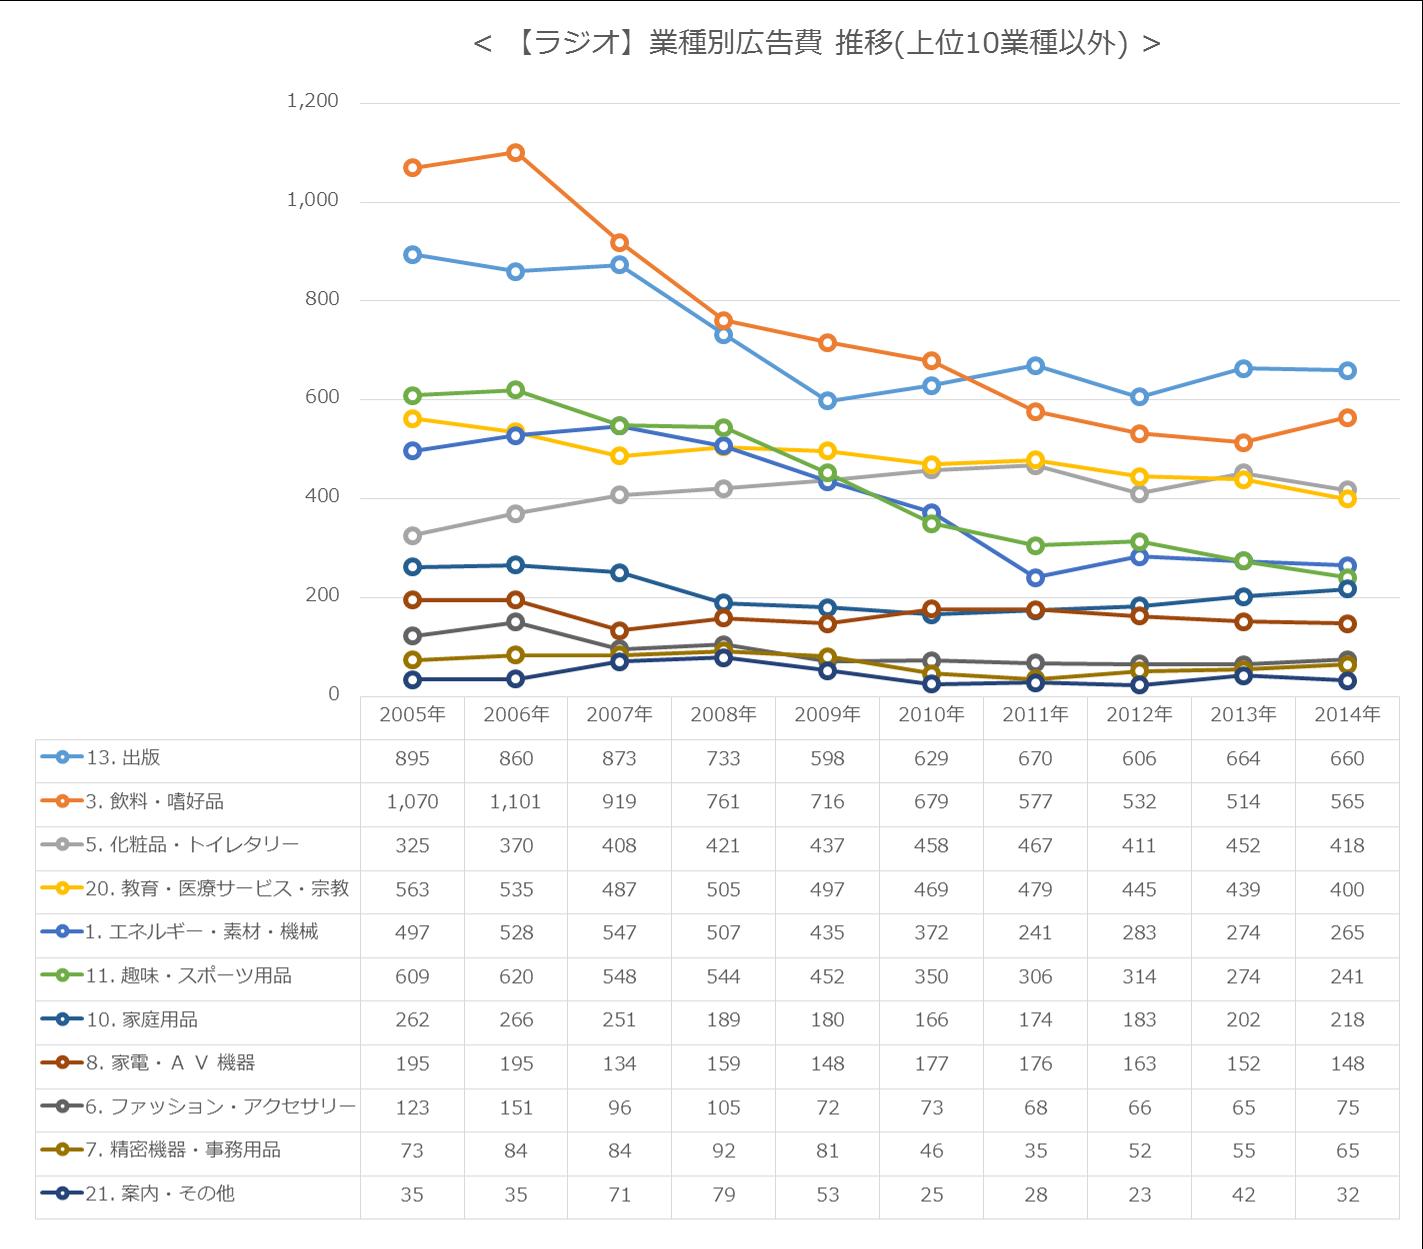 【ラジオ】業種別広告費 推移(上位10業種以外)